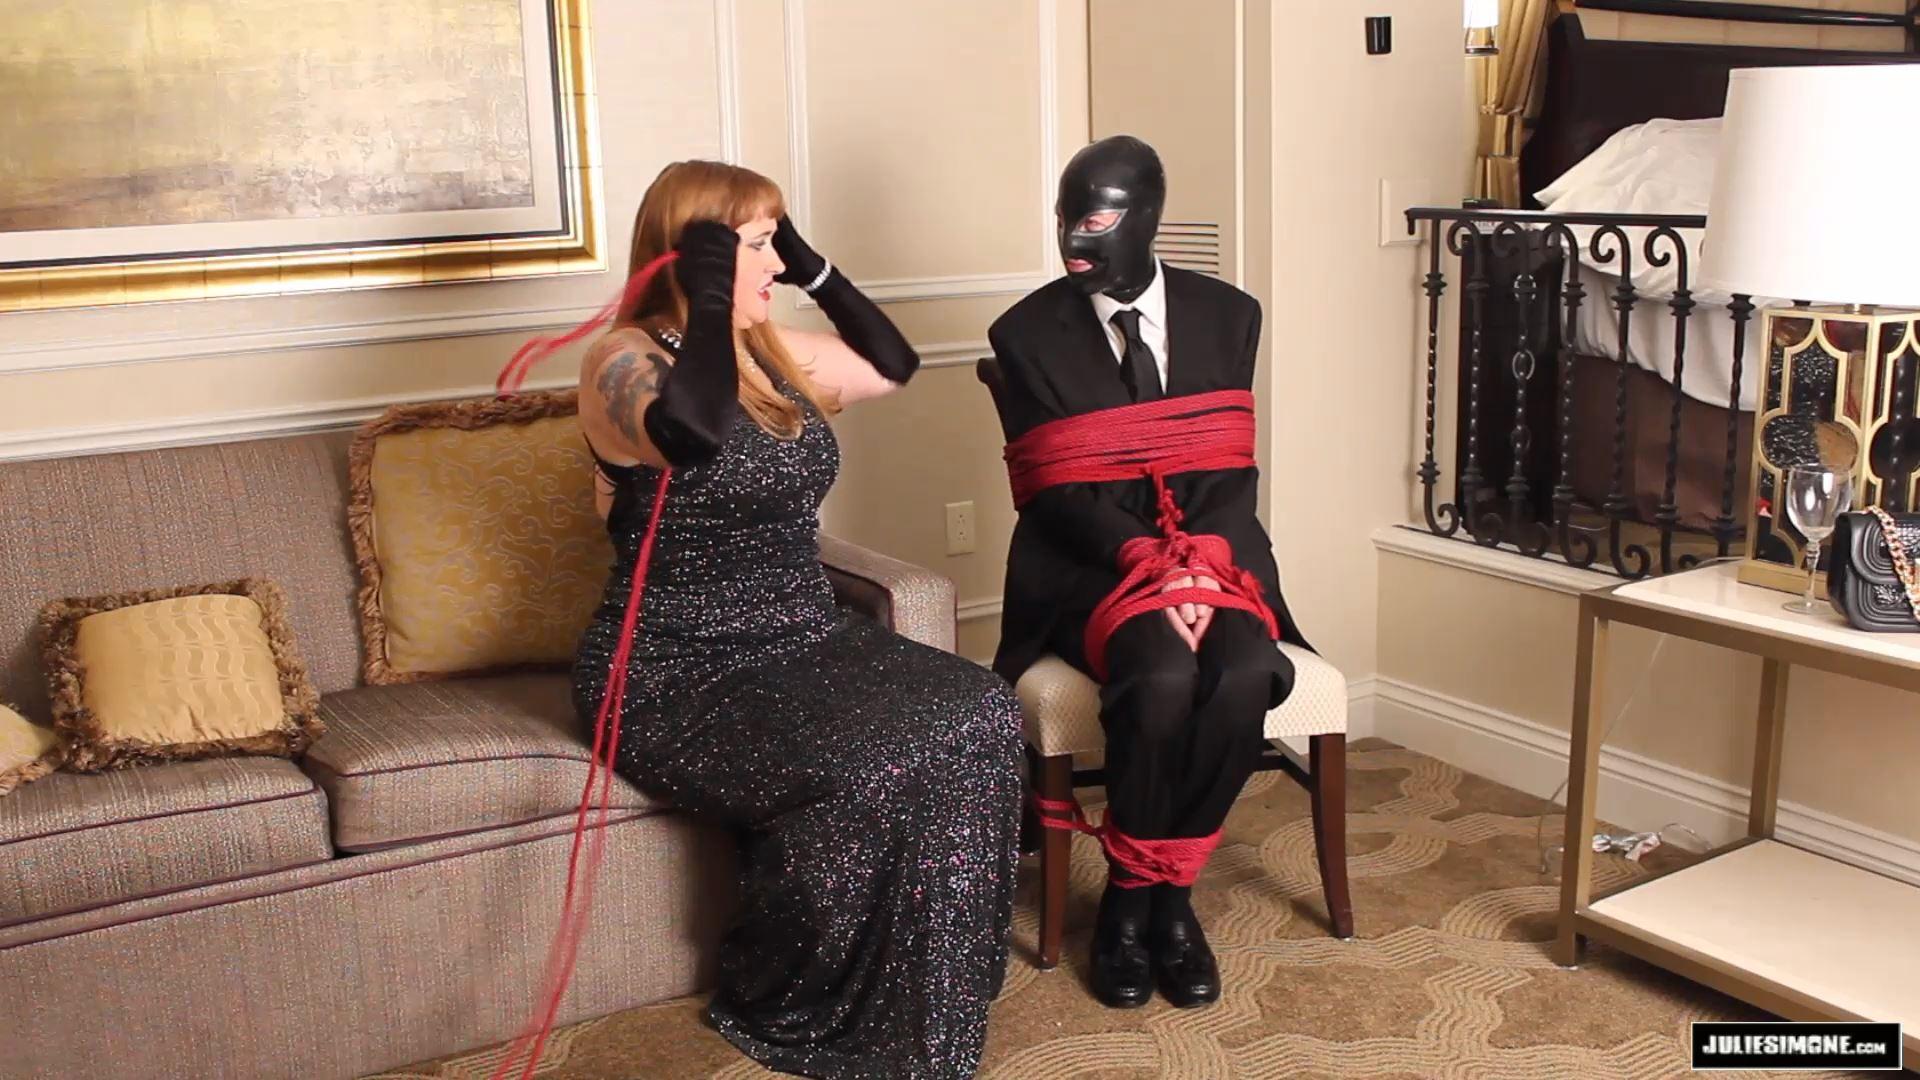 Julie Simone In Scene: Date Night Bondage Surprise Part 1 - JULIESIMONE - FULL HD/1080p/MP4